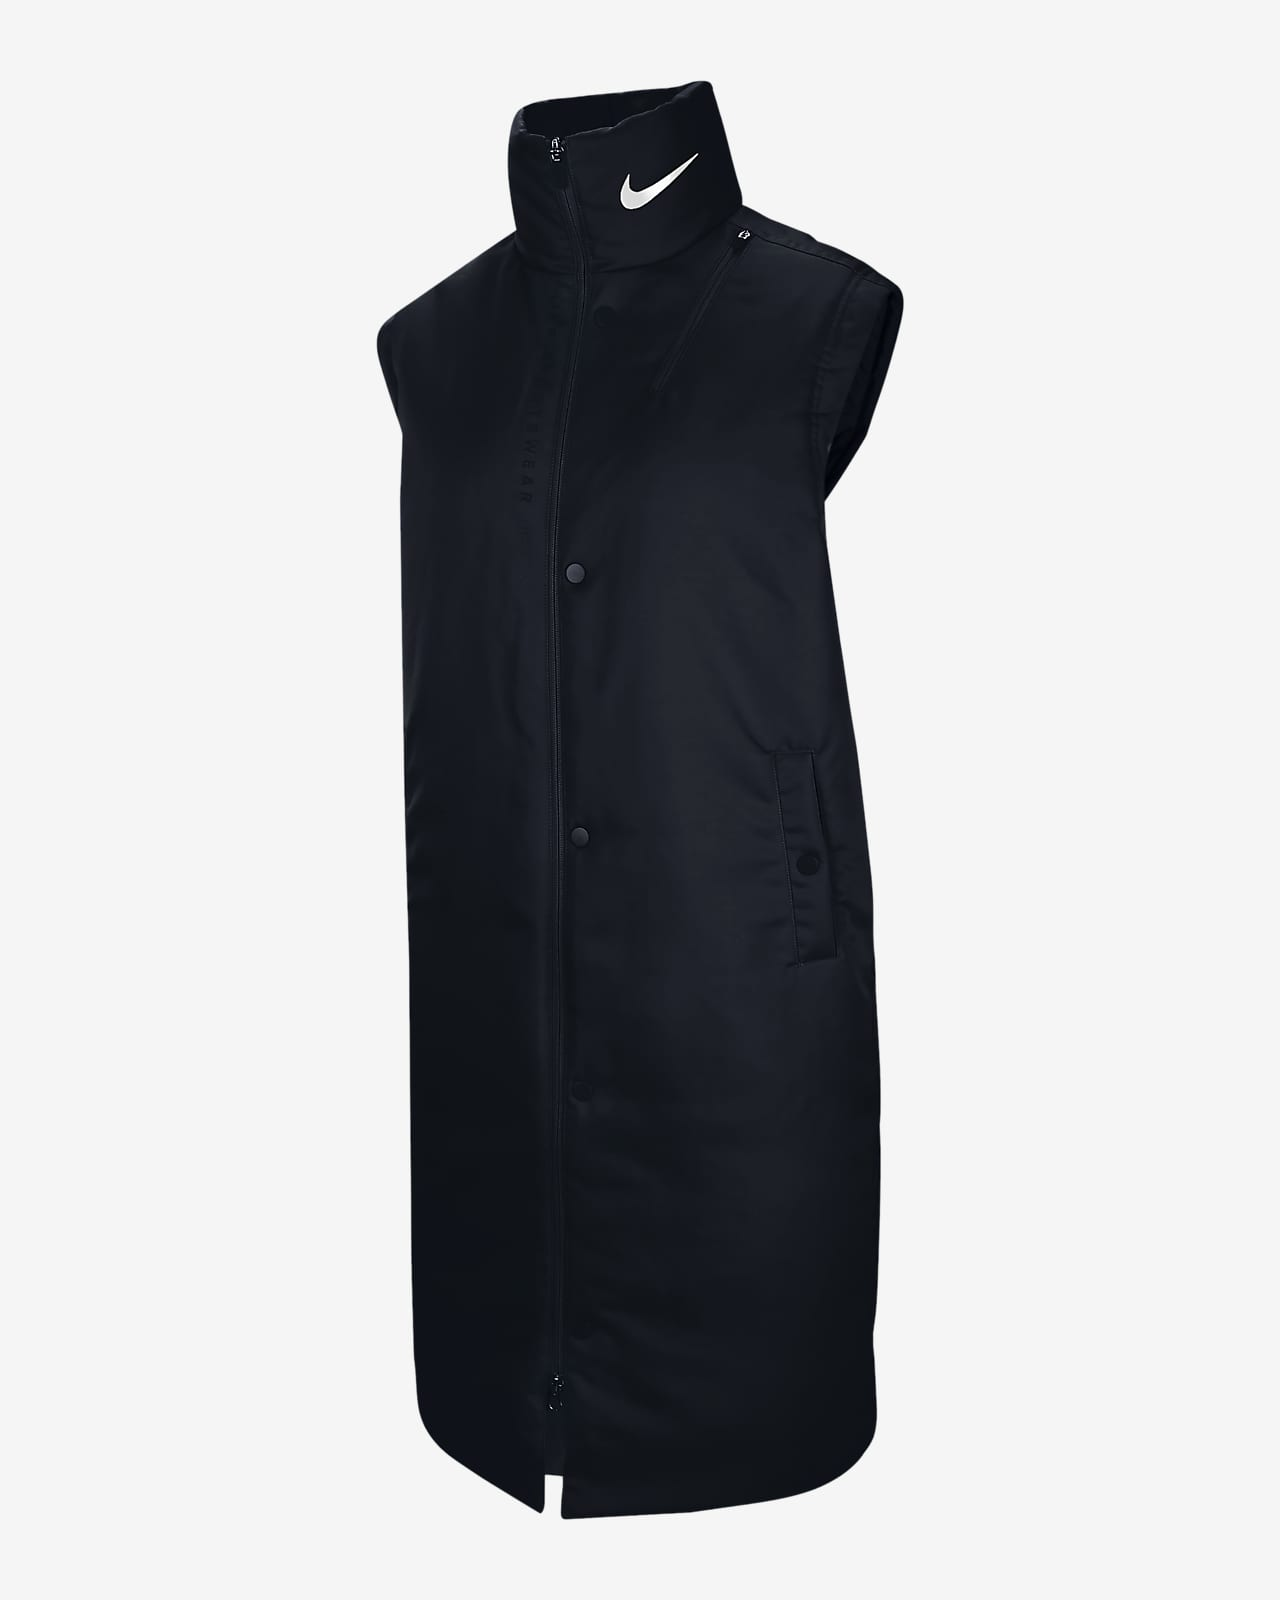 Veste sans manches Nike Sportswear Synthetic Fill pour Femme